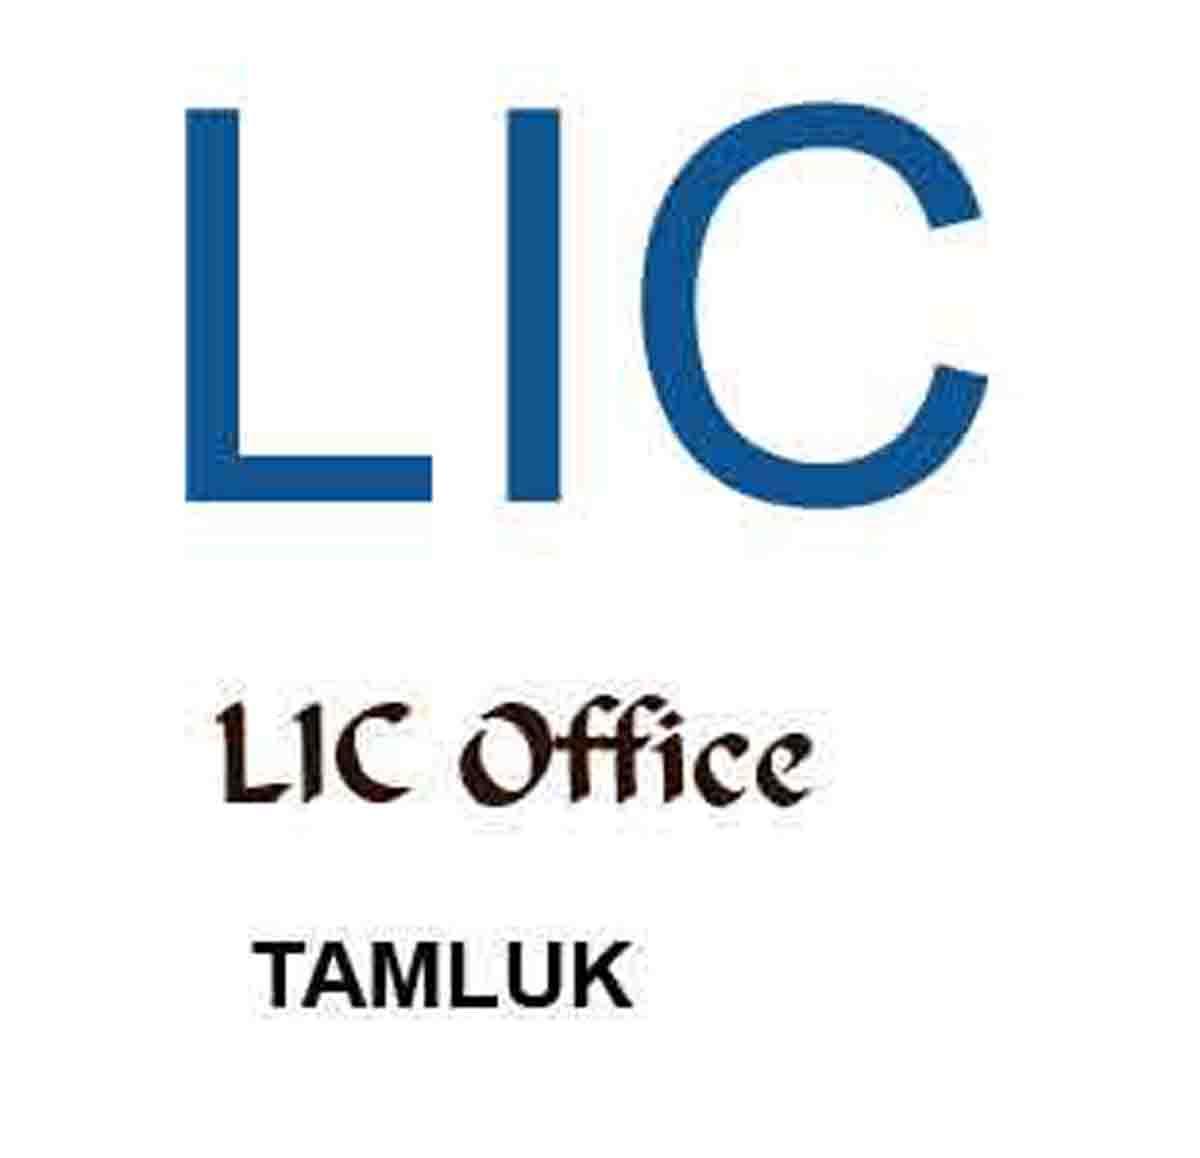 lic office tamluk